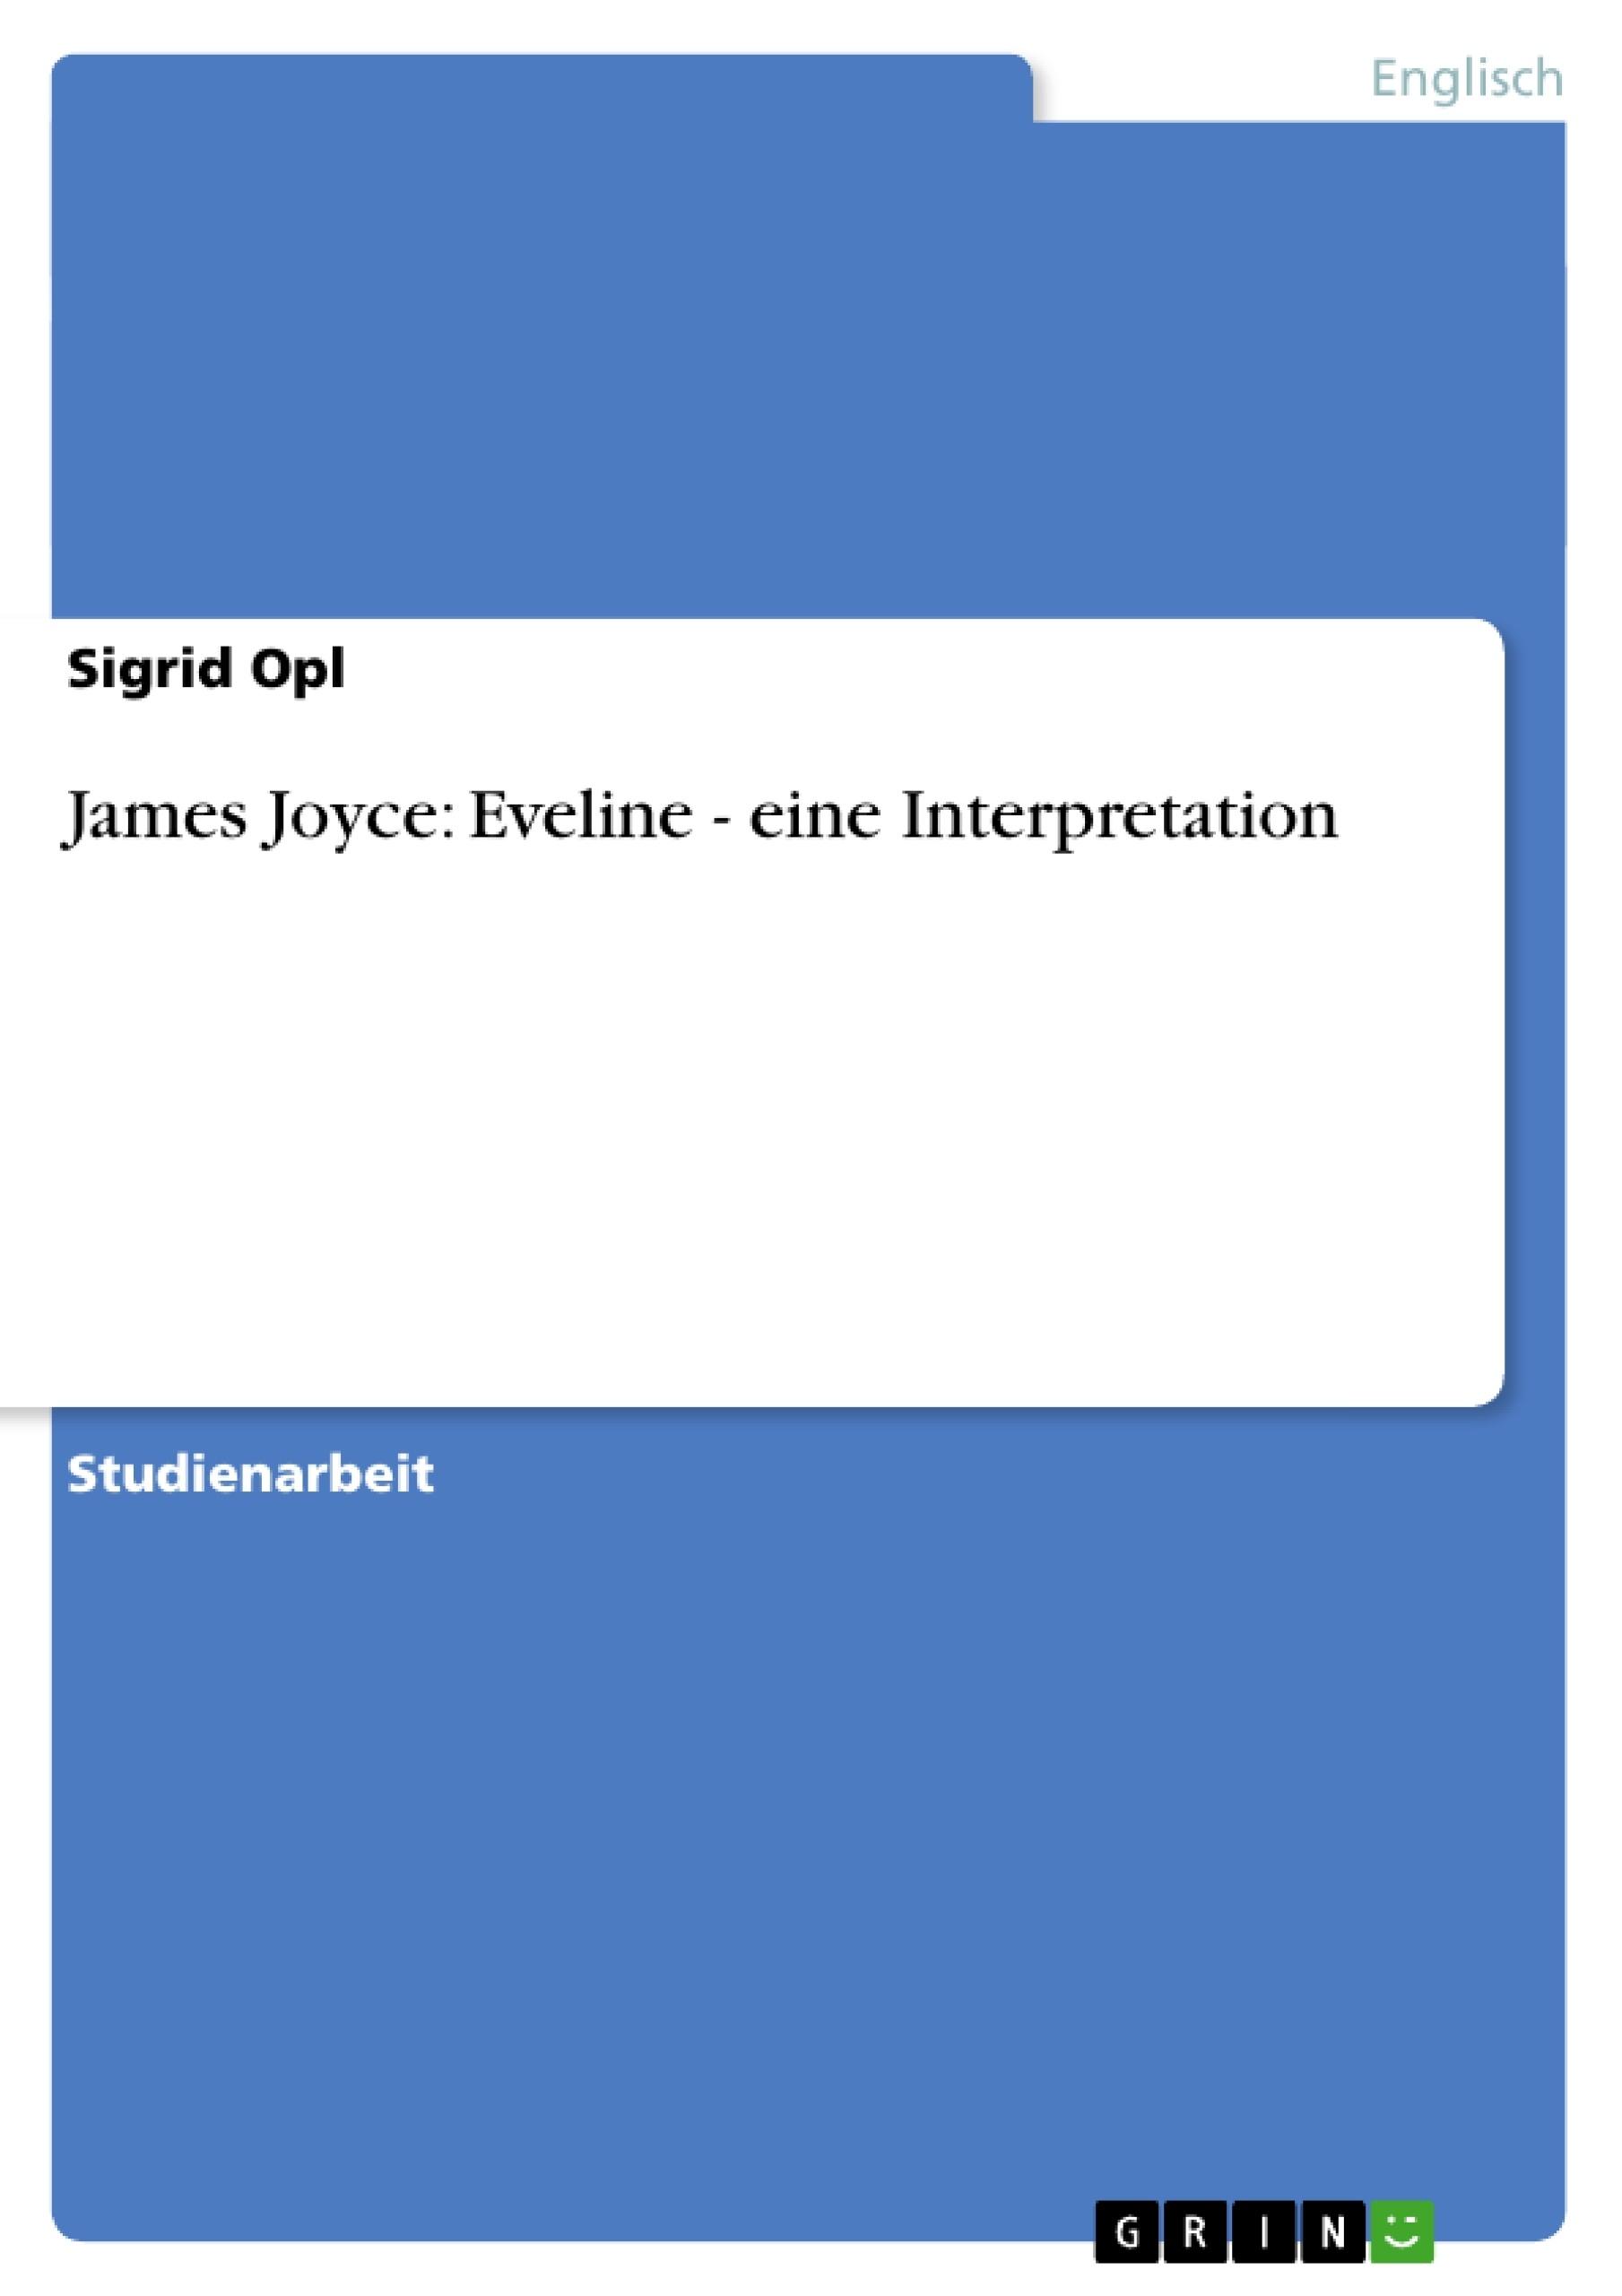 Titel: James Joyce: Eveline - eine Interpretation